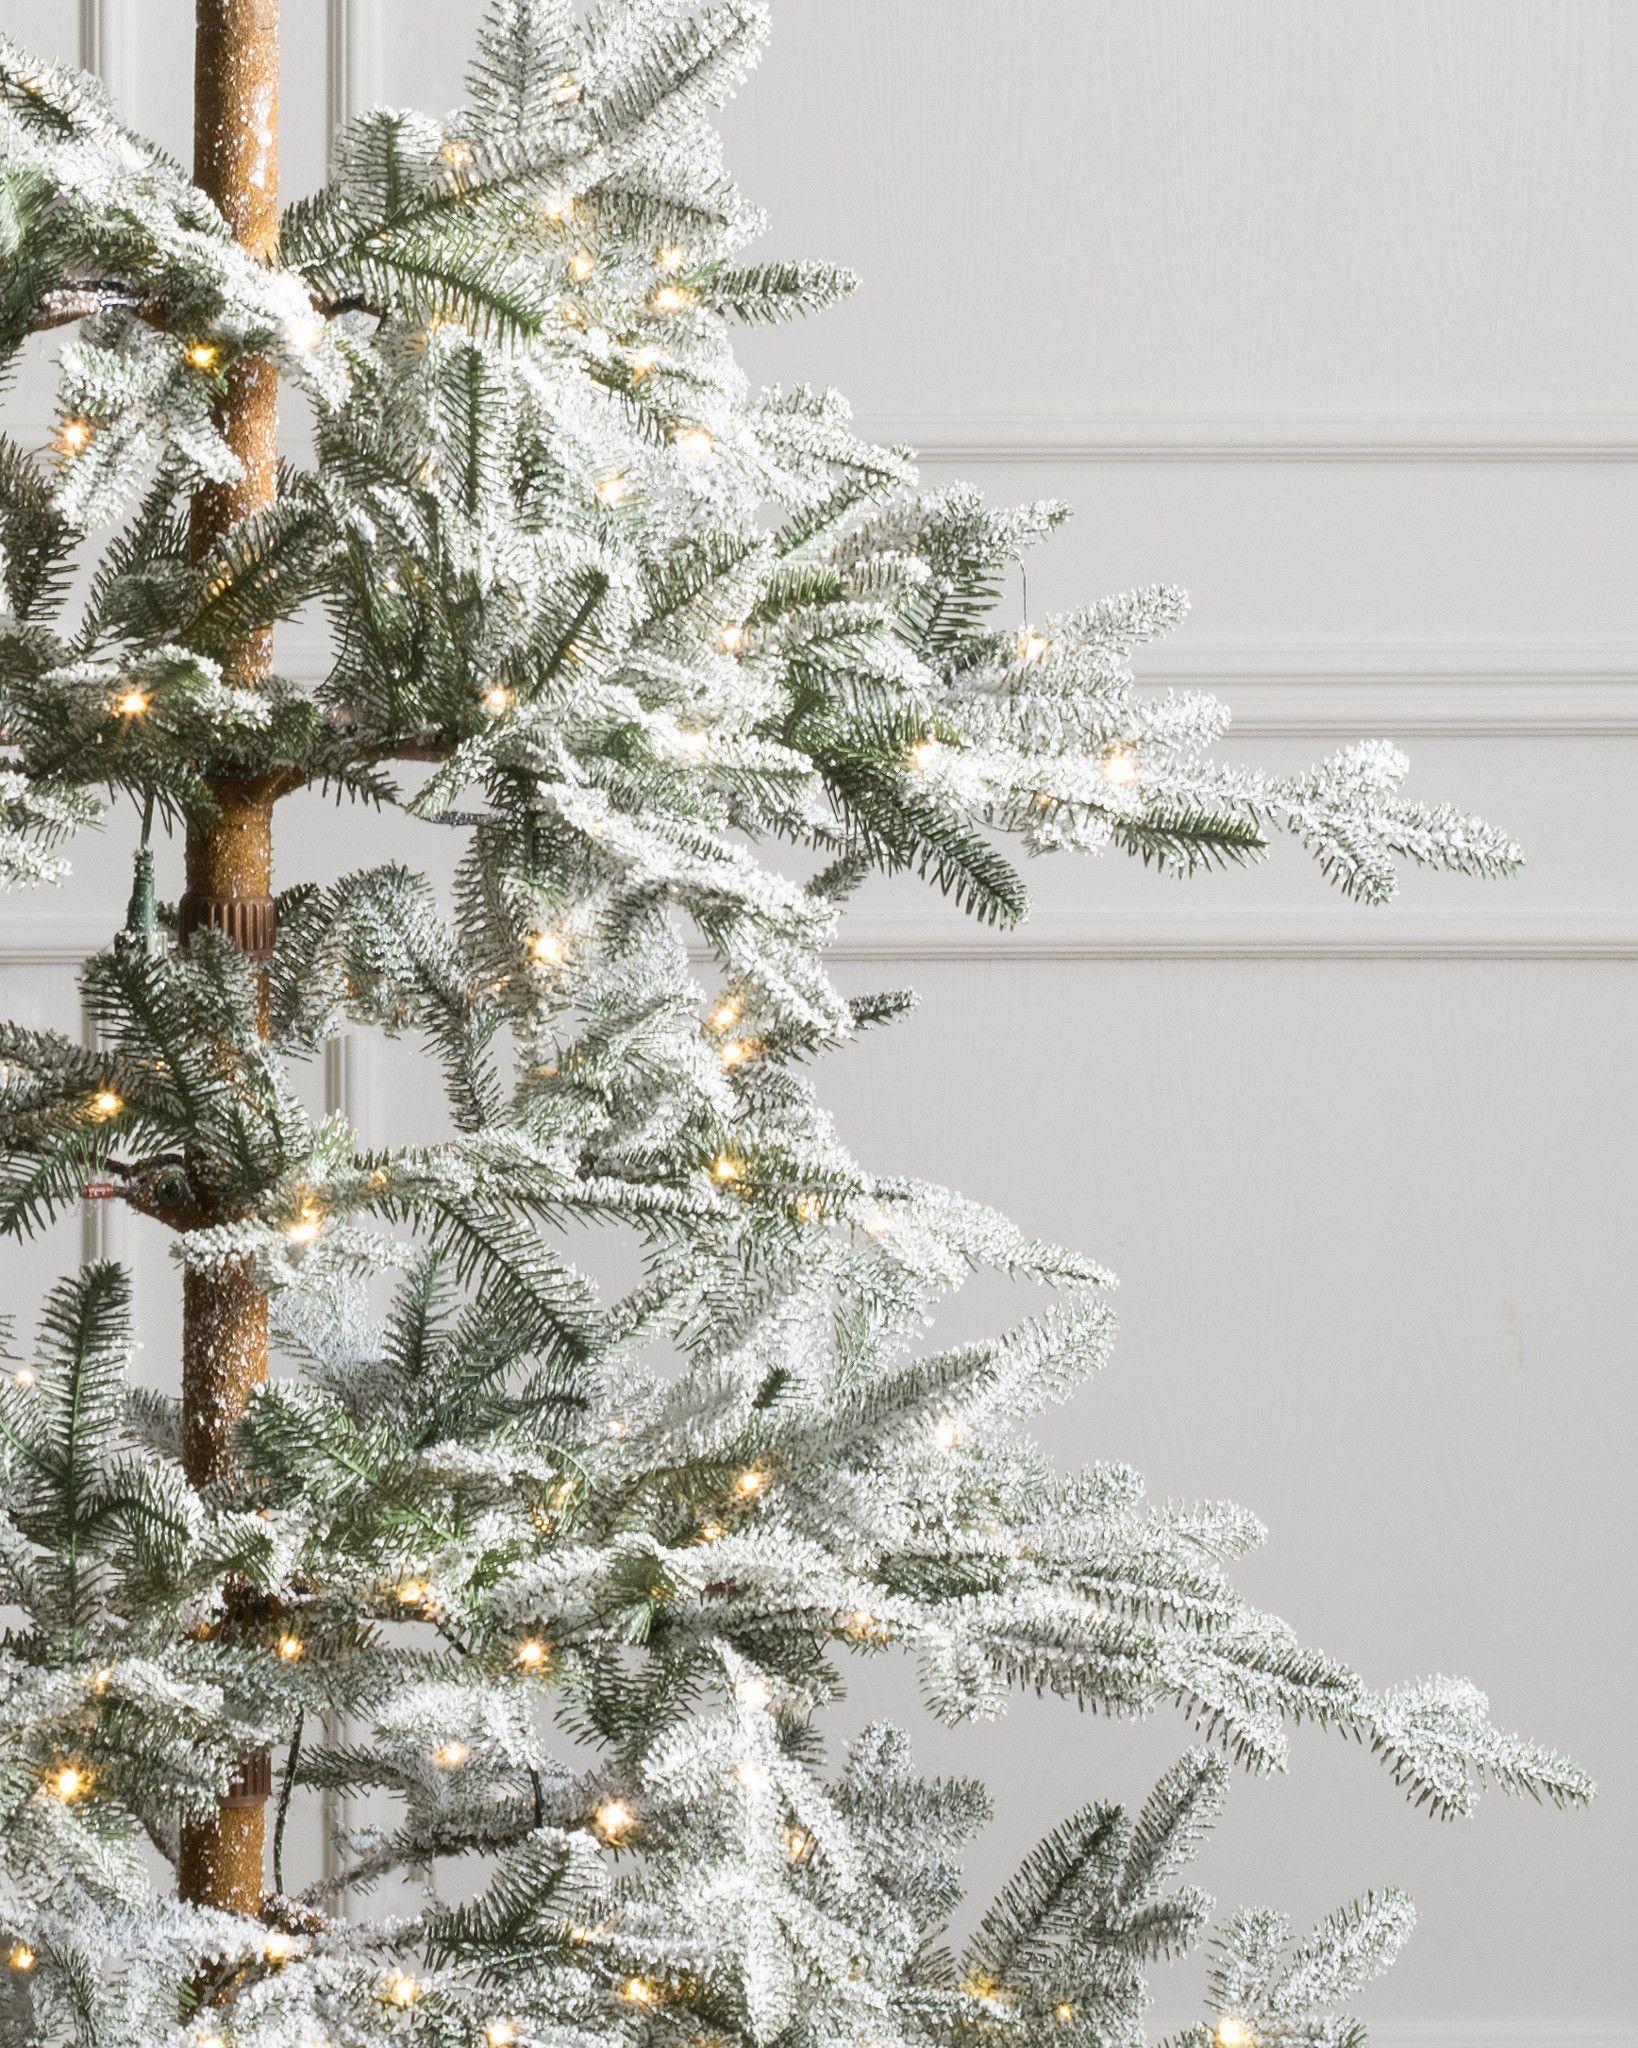 Vermont Christmas Ornaments